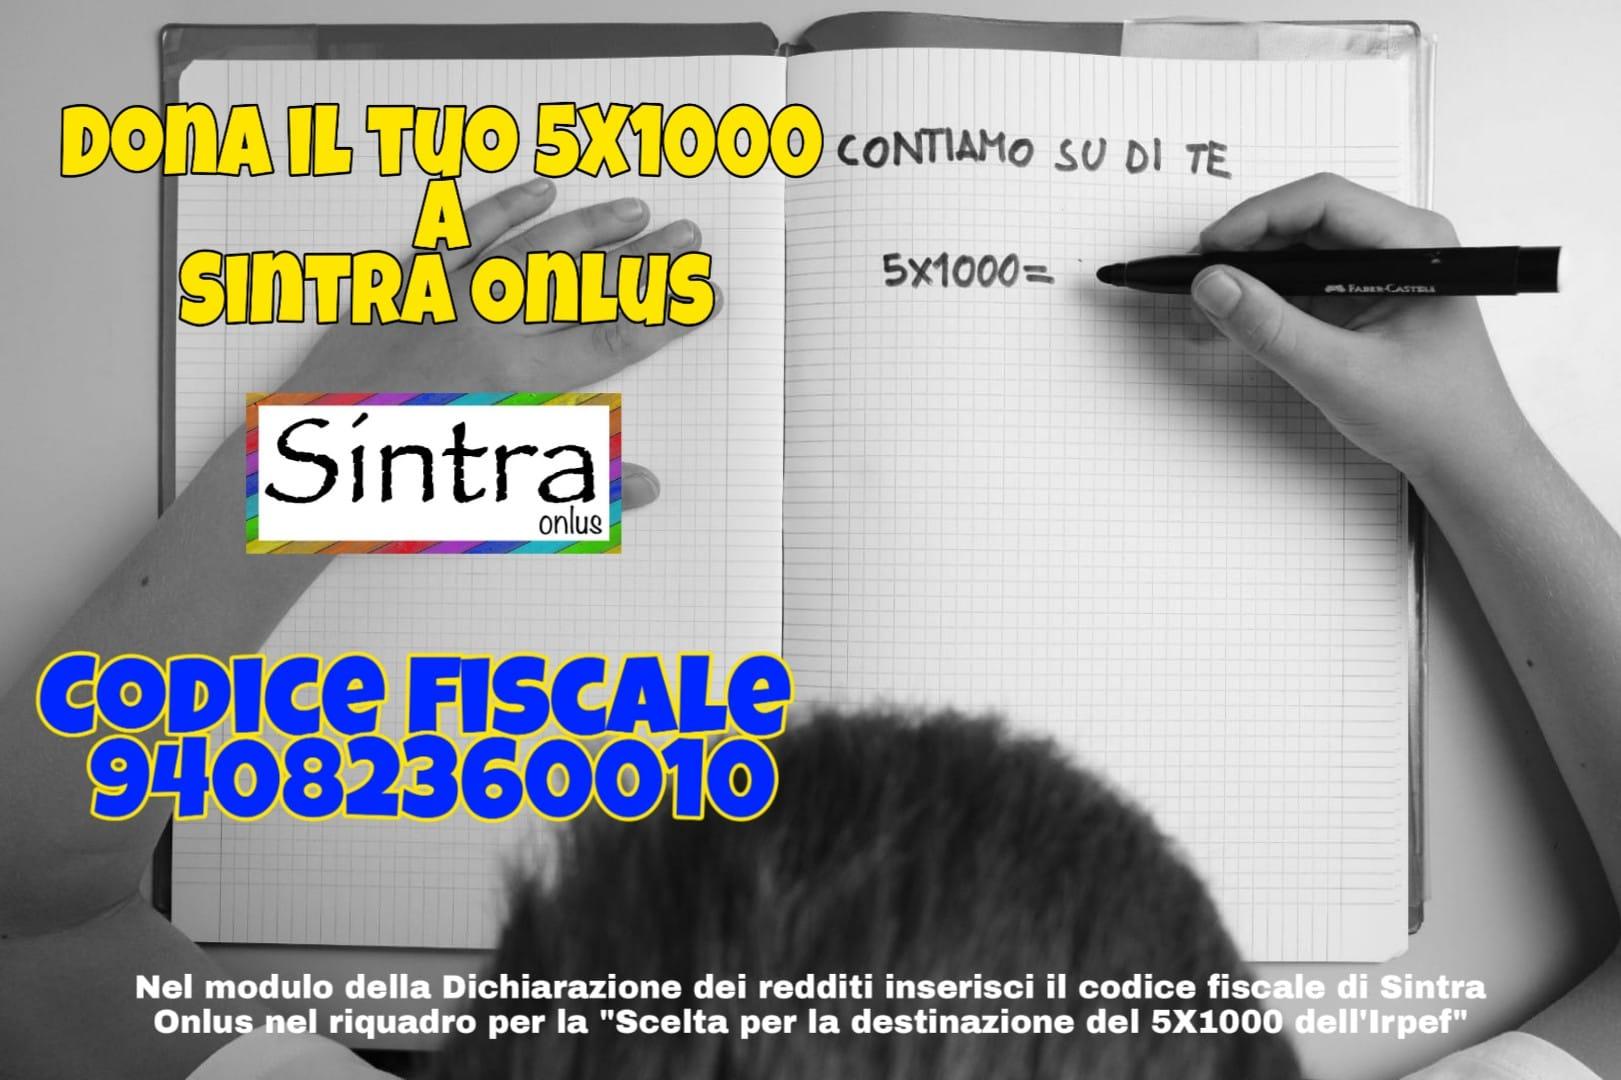 Dona il tuo 5X1000 a Sintra Onlus!